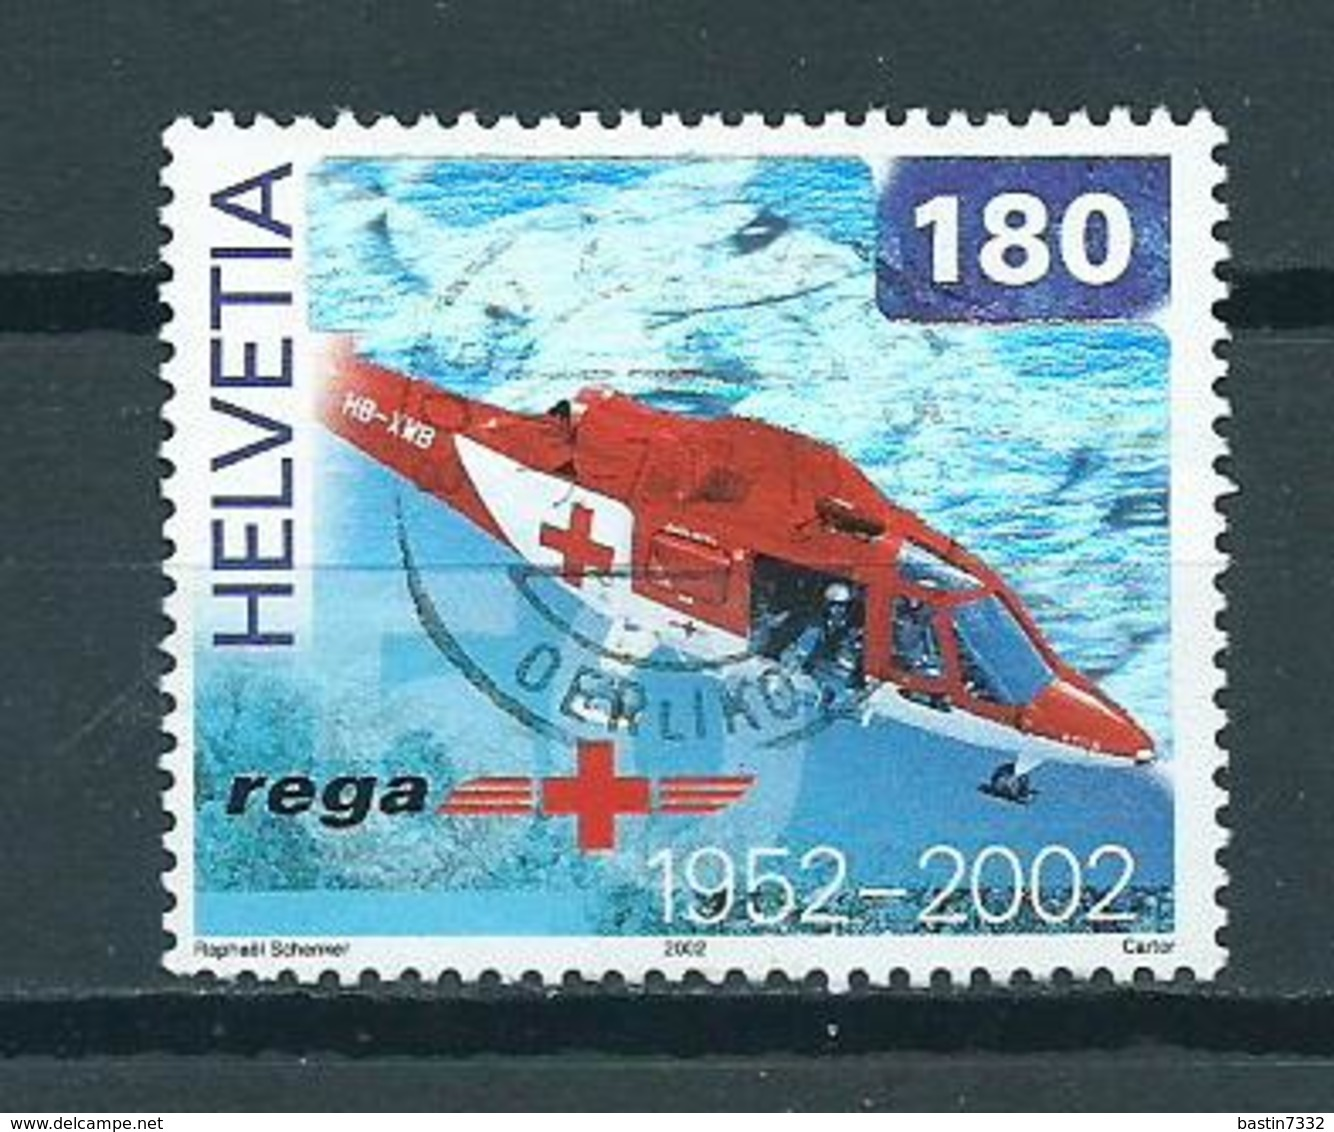 2002 Switzerland 180 Helicopter,REGA Used/gebruikt/oblitere - Zwitserland